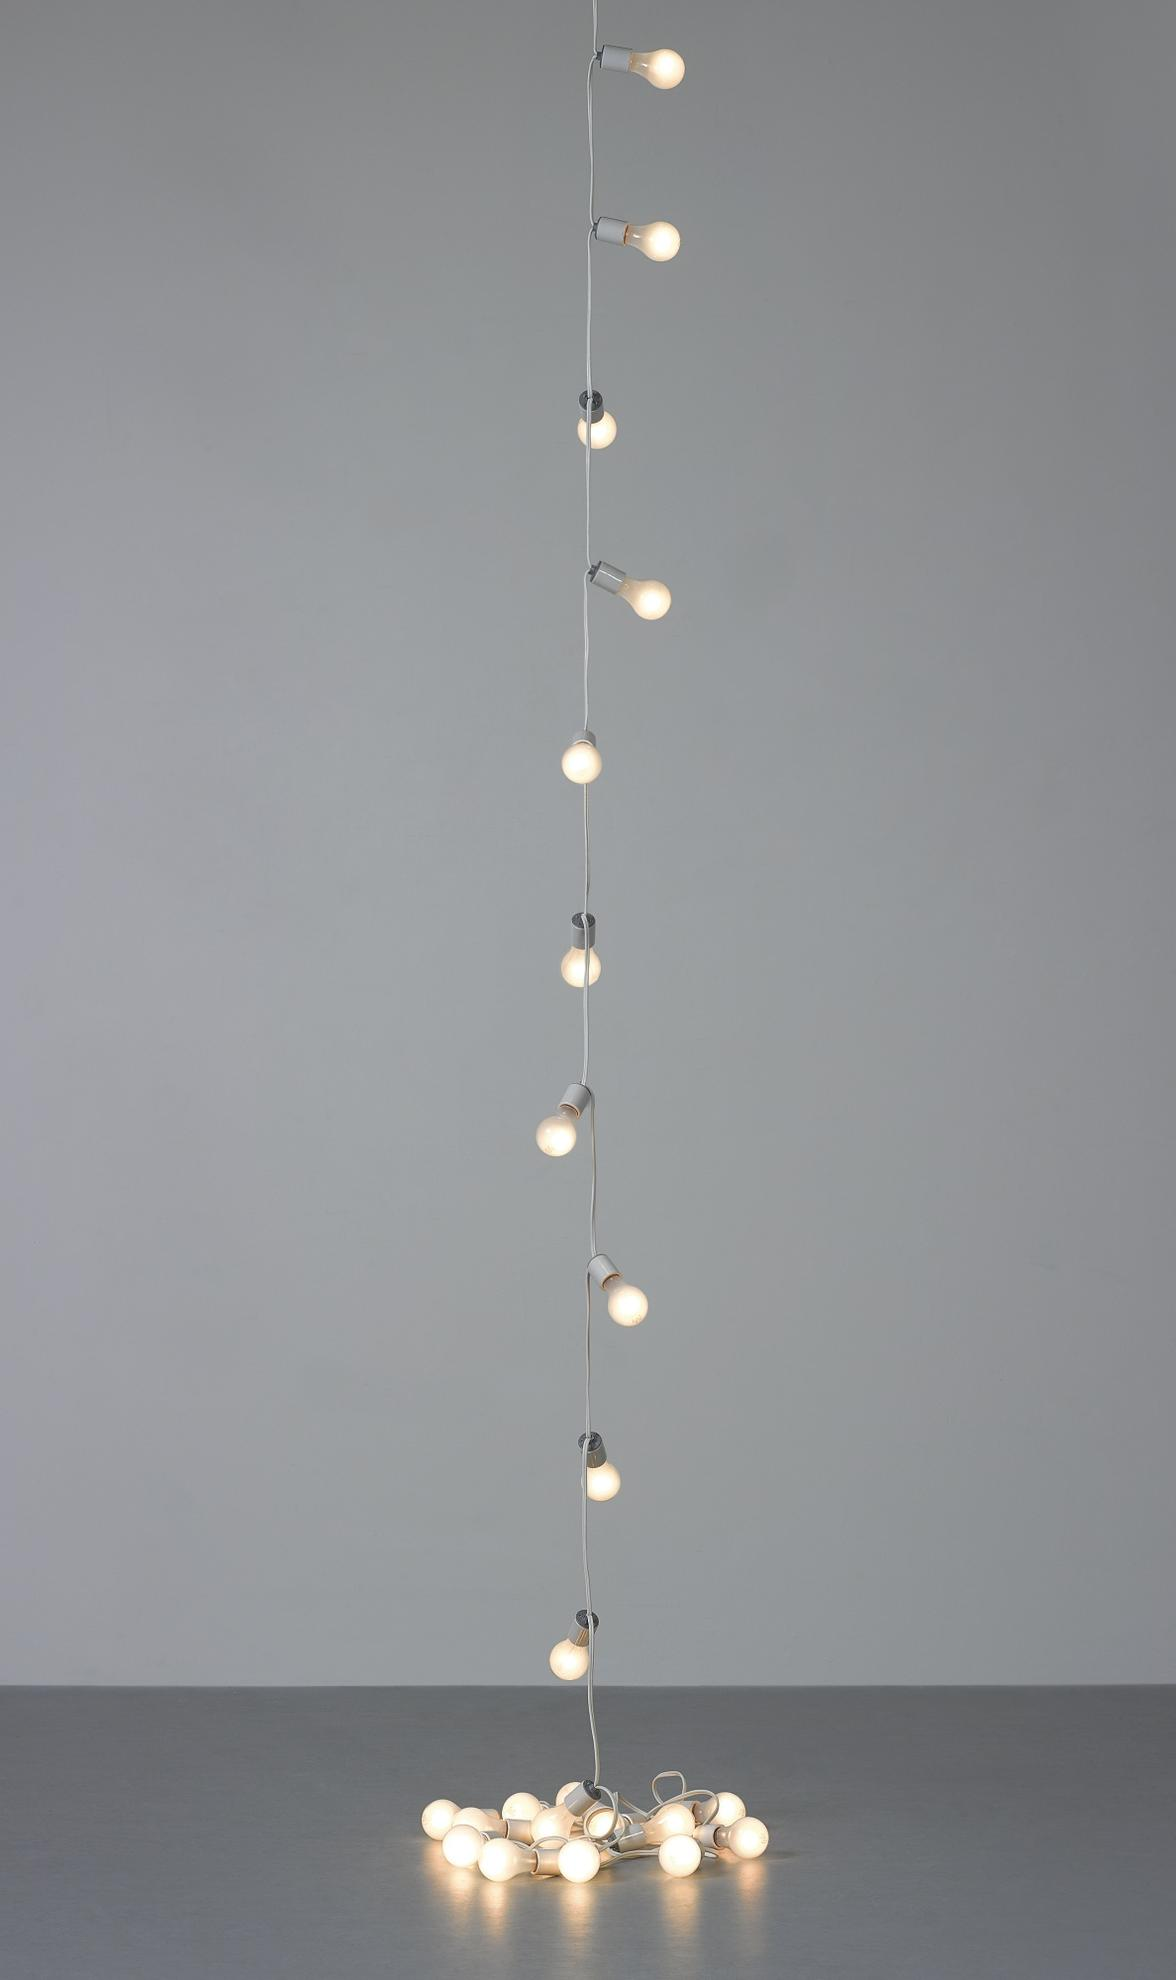 Felix Gonzalez-Torres-'Untitled'-1992